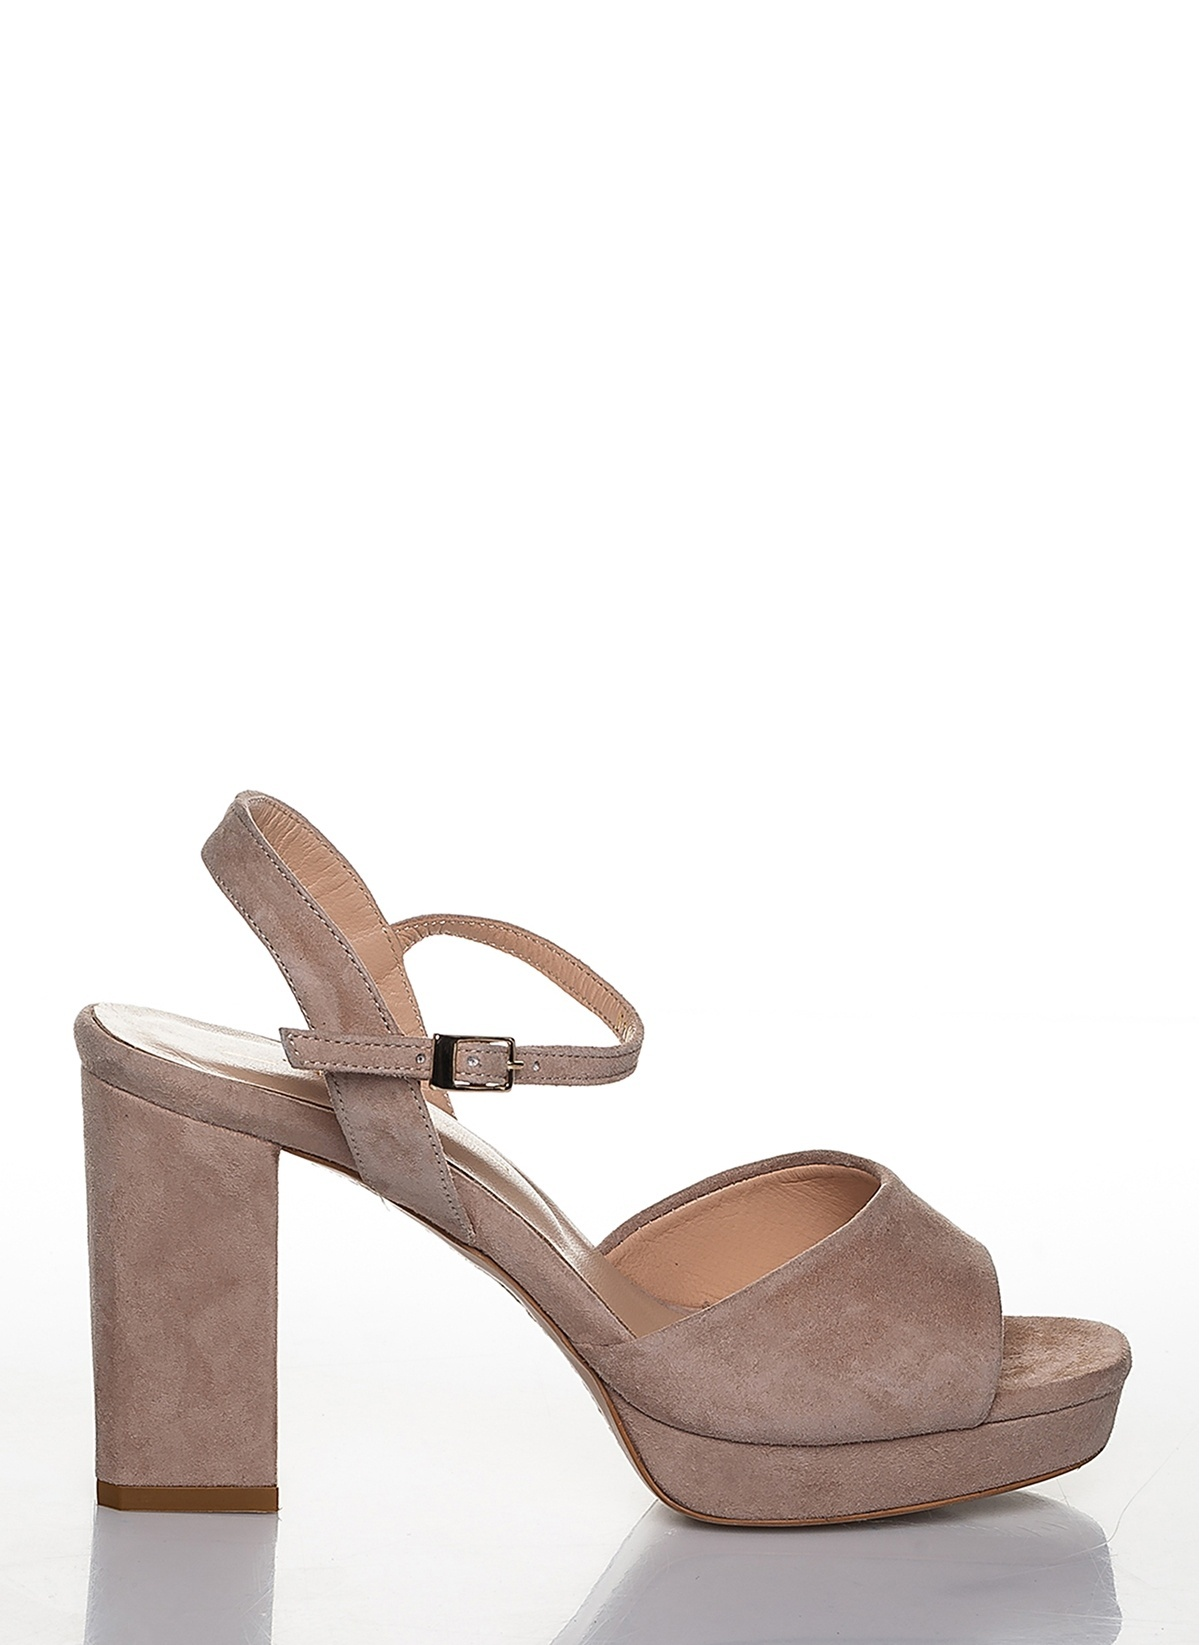 Efem Ayakkabı 19yvcn5173109-stiletto – 560.0 TL